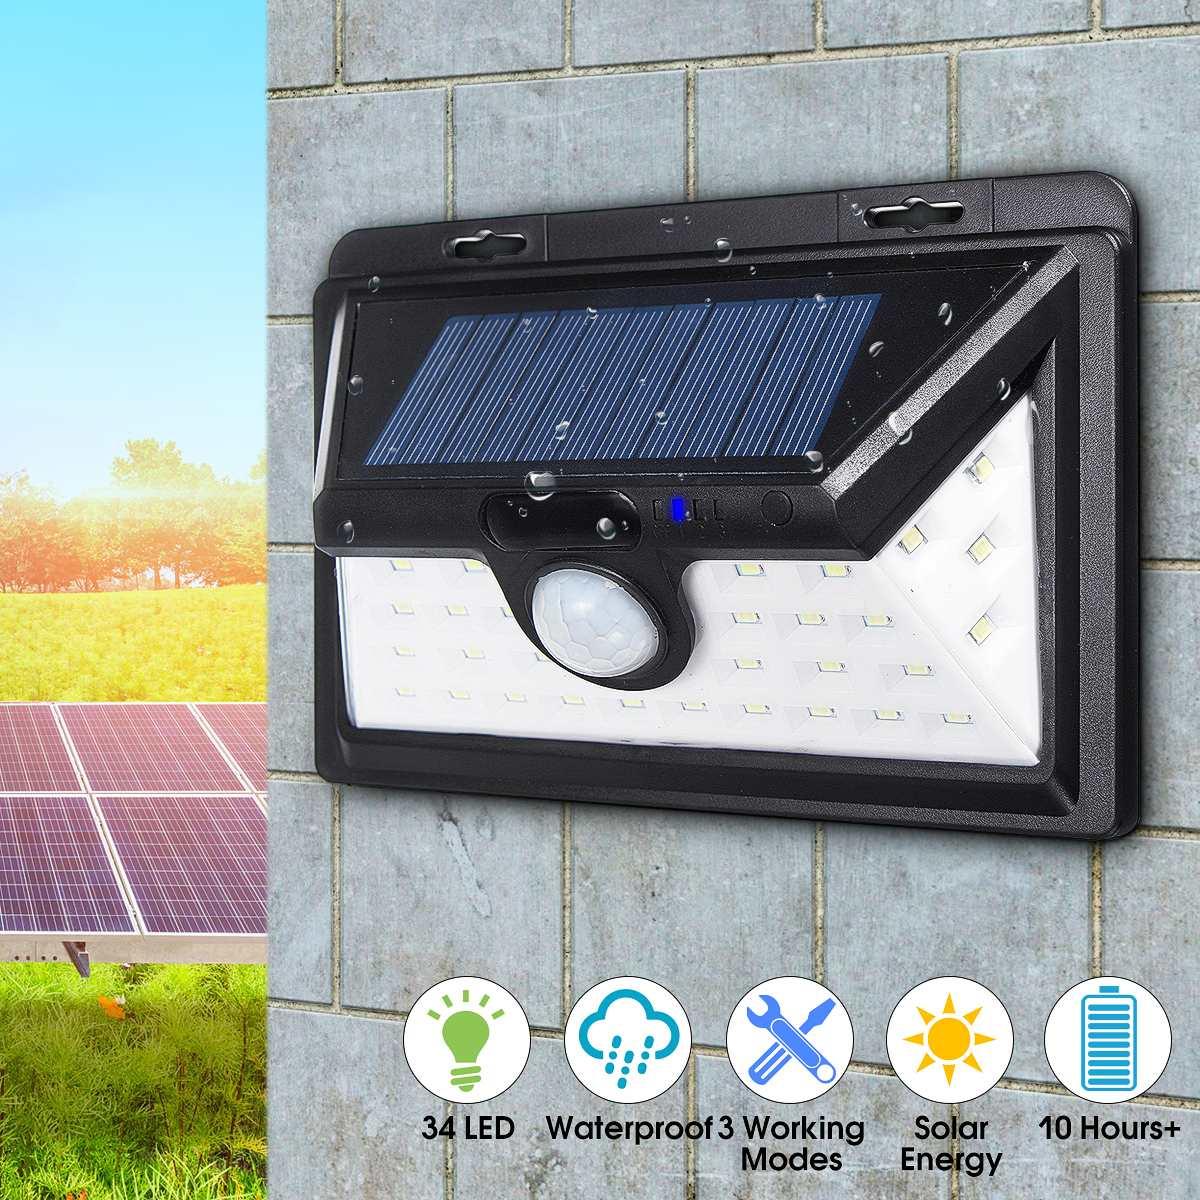 PIR Motion Sensor 34 LED Solar Power Solar Light Light Motion Sensor Outdoor Security Wall Lamp Garden Light Waterproof ds 360 solar sensor led light black